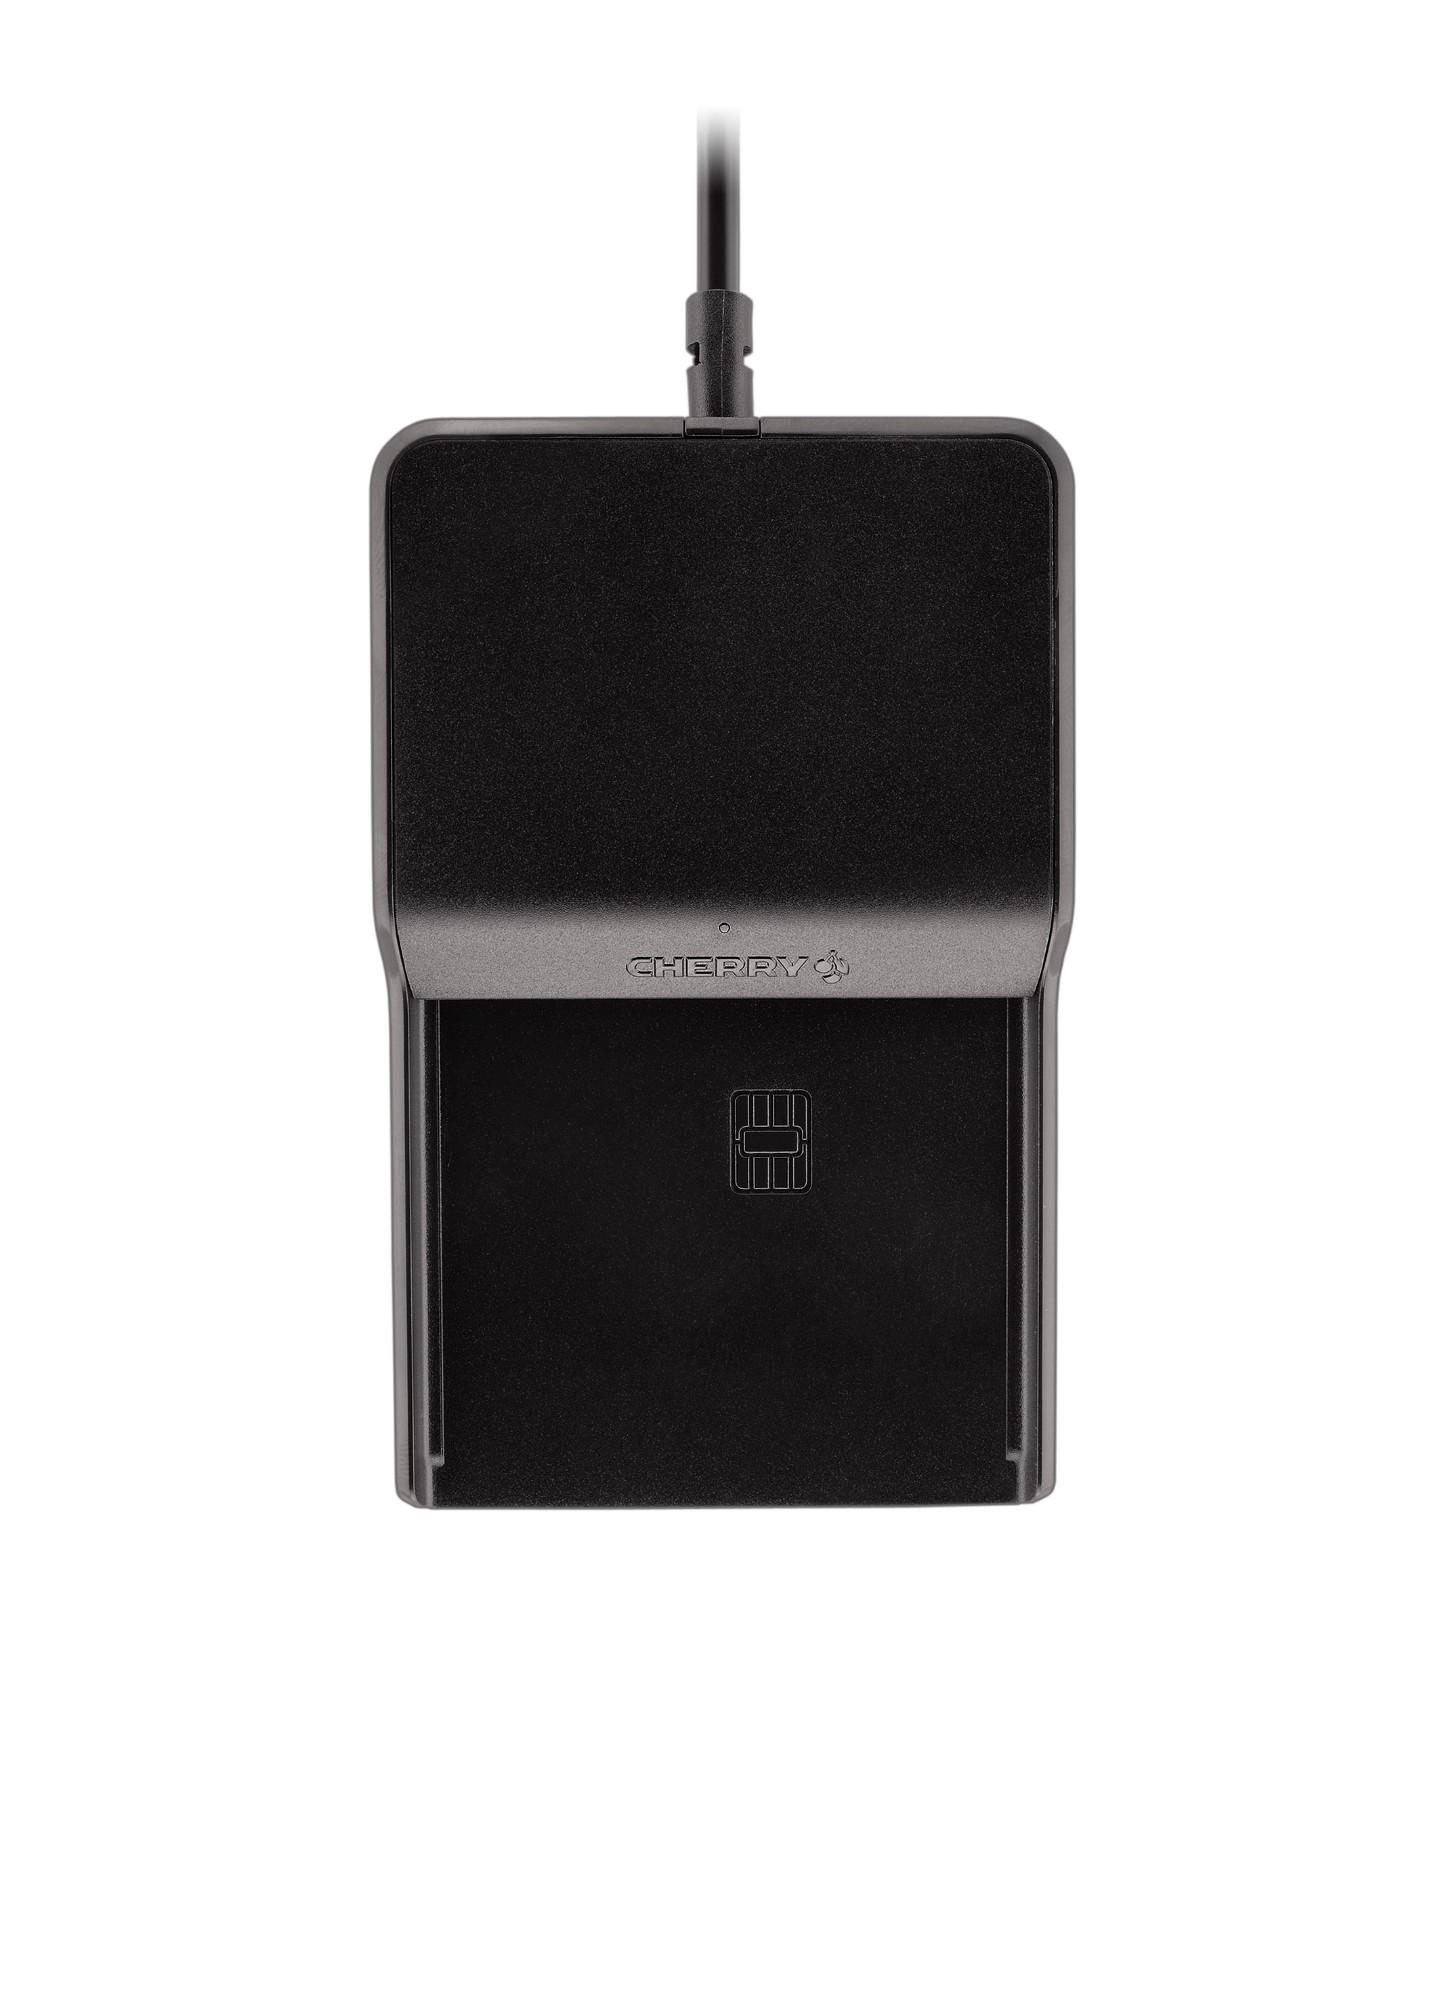 CHERRY TC 1100 Indoor USB 2.0 Black smart card reader